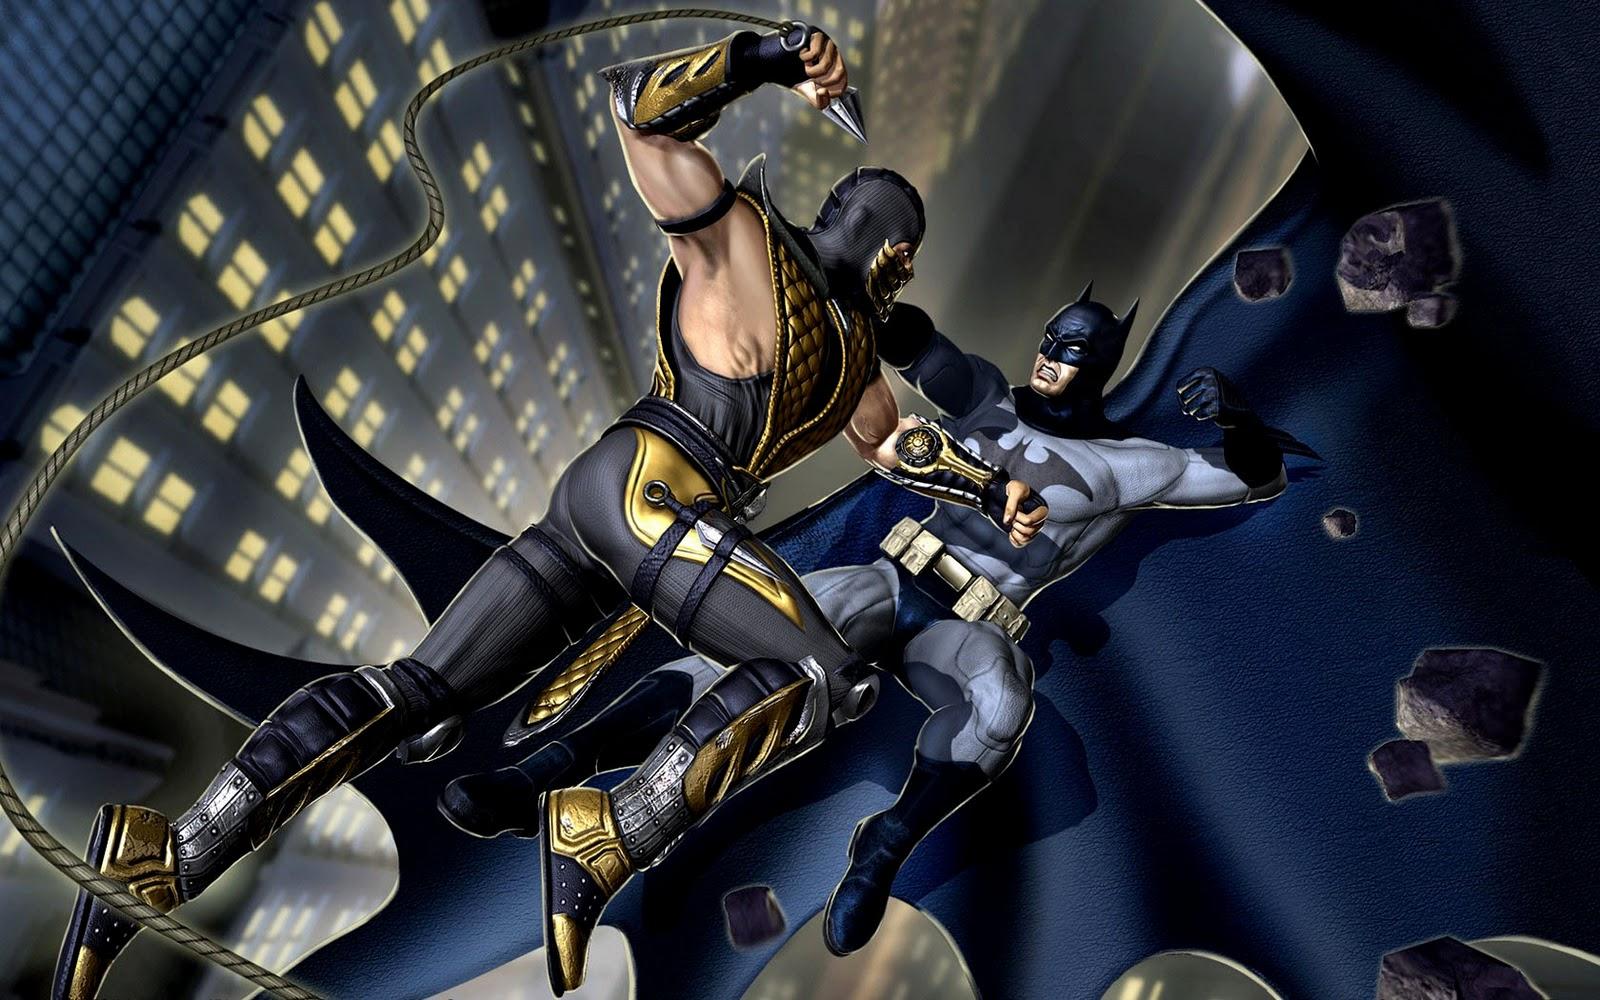 imagens para celular mortal kombat - Baixar de graça Mortal Kombat as imagens para telefone